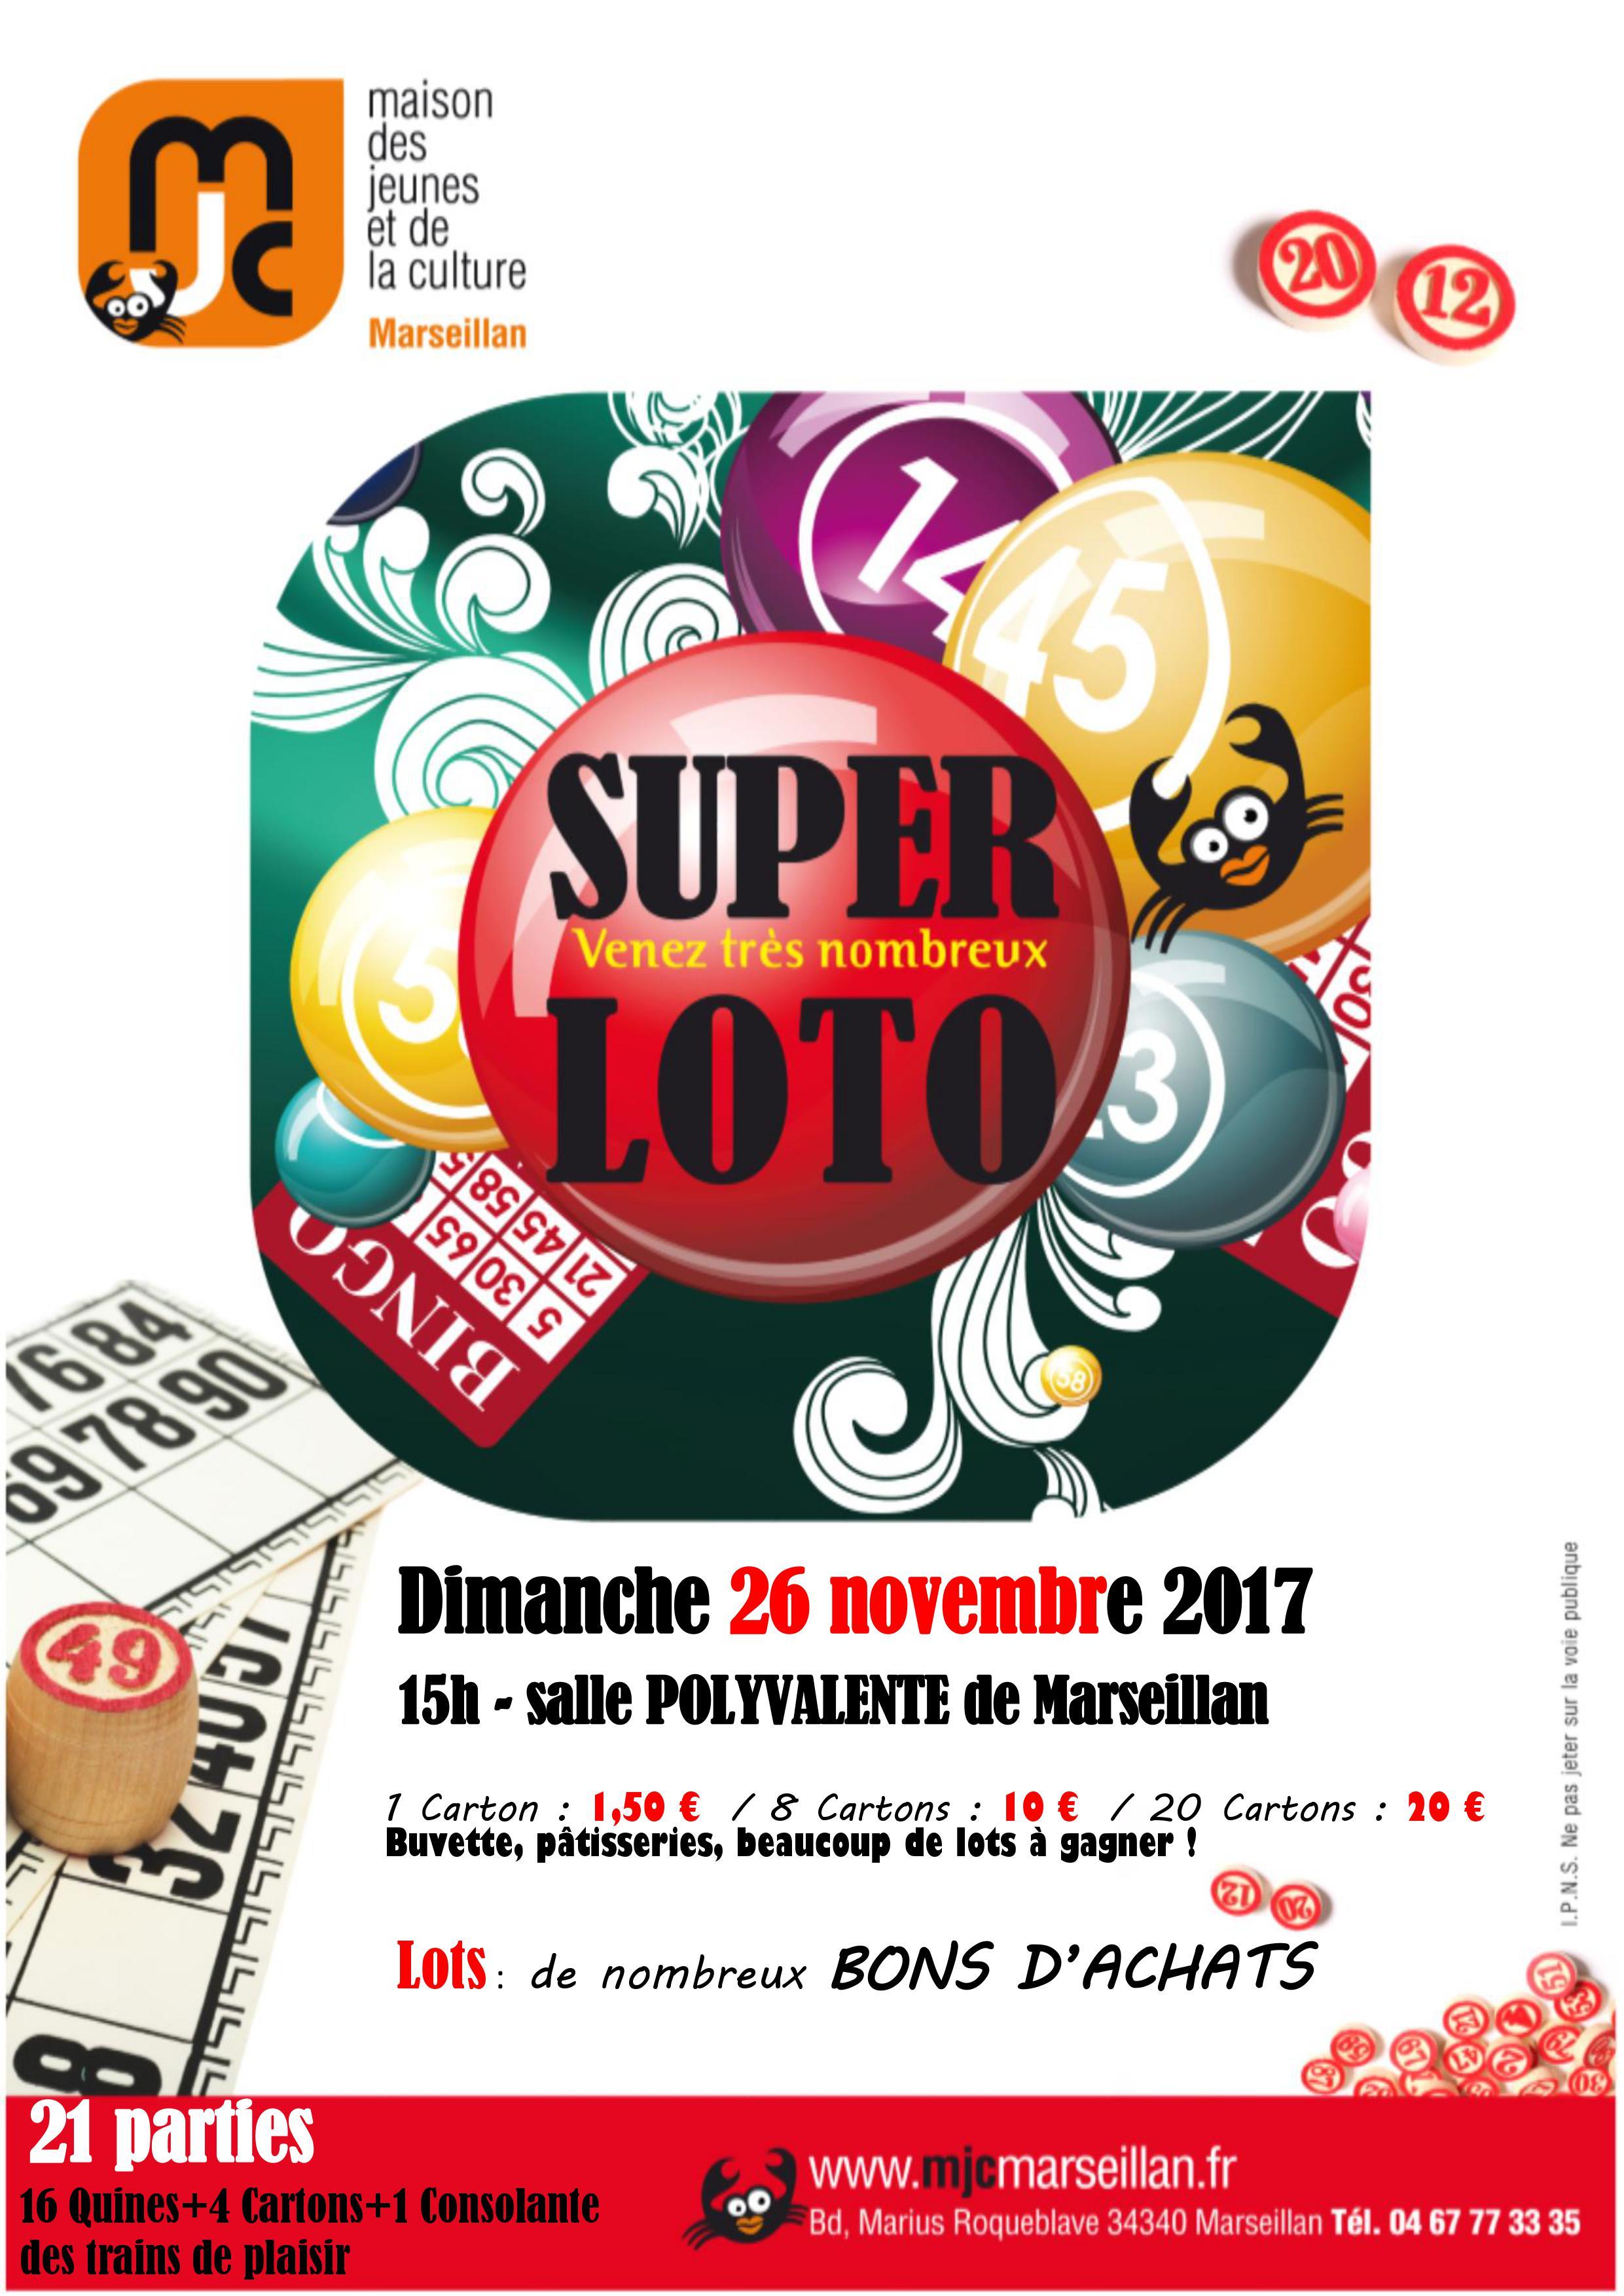 Dimanche 26 novembre 2017 : loto de la MJC